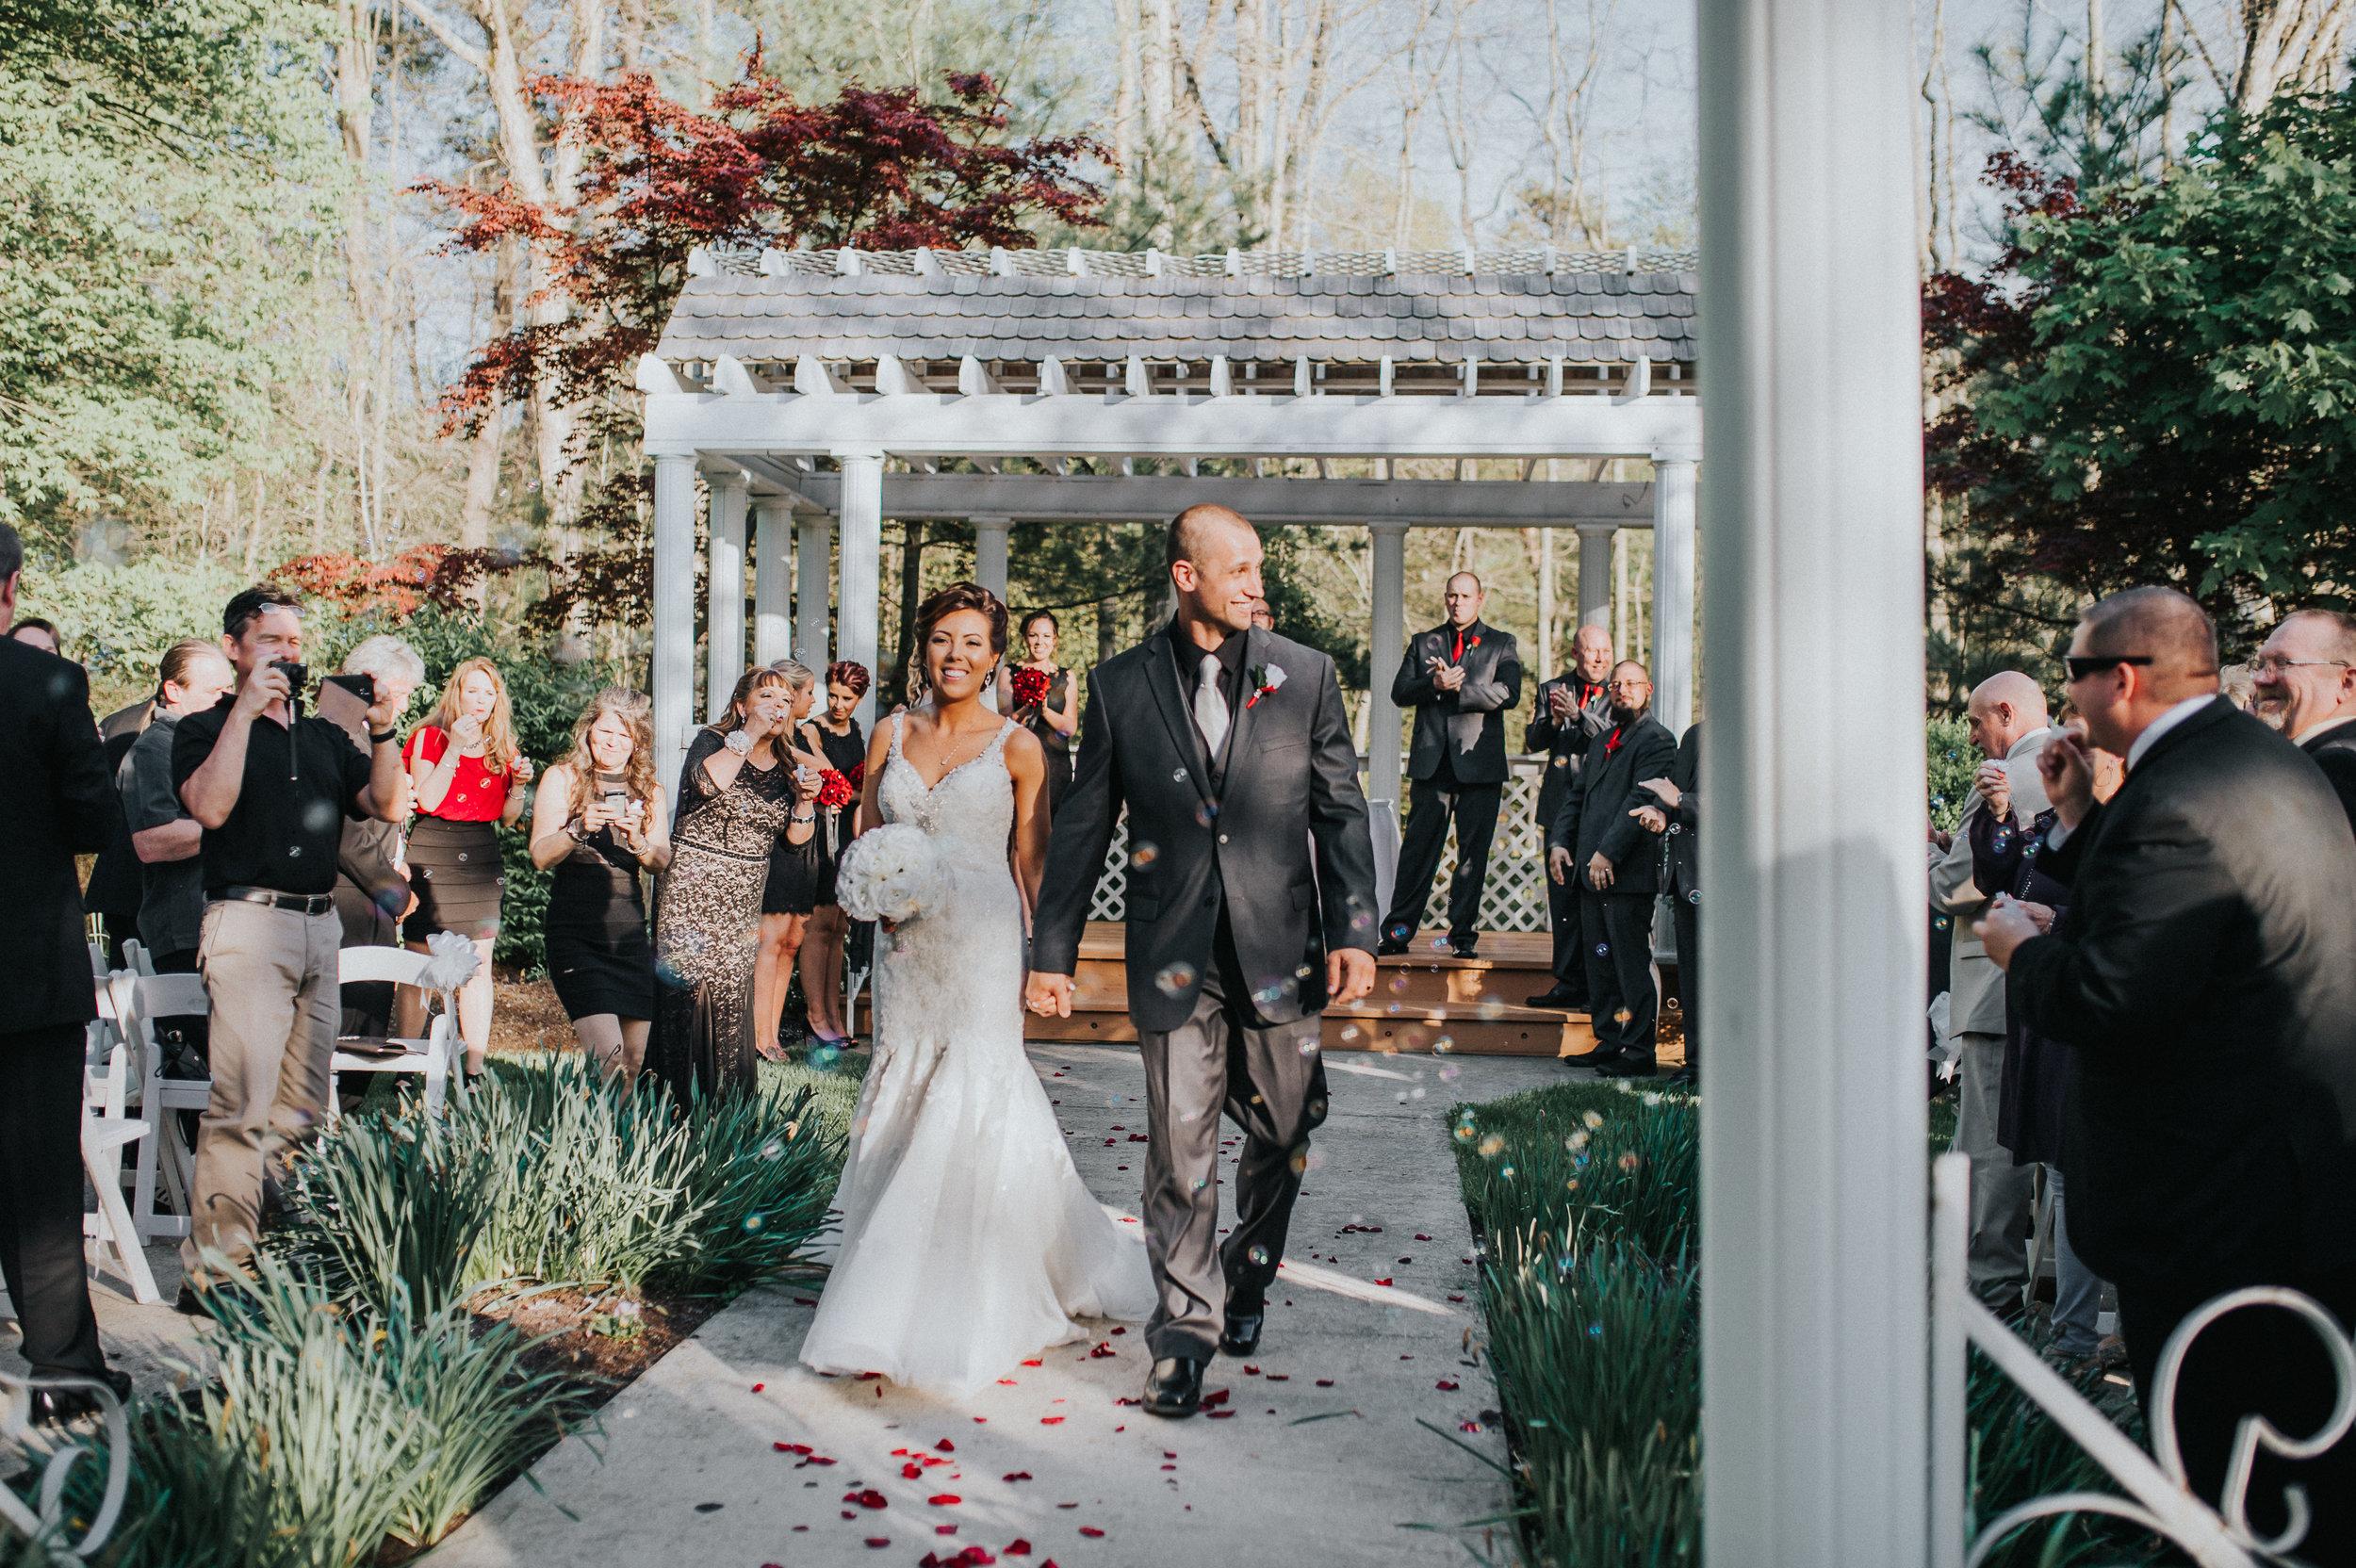 Christina-and-Gene-Wedding-Marla-Rain-Photography-362.jpg